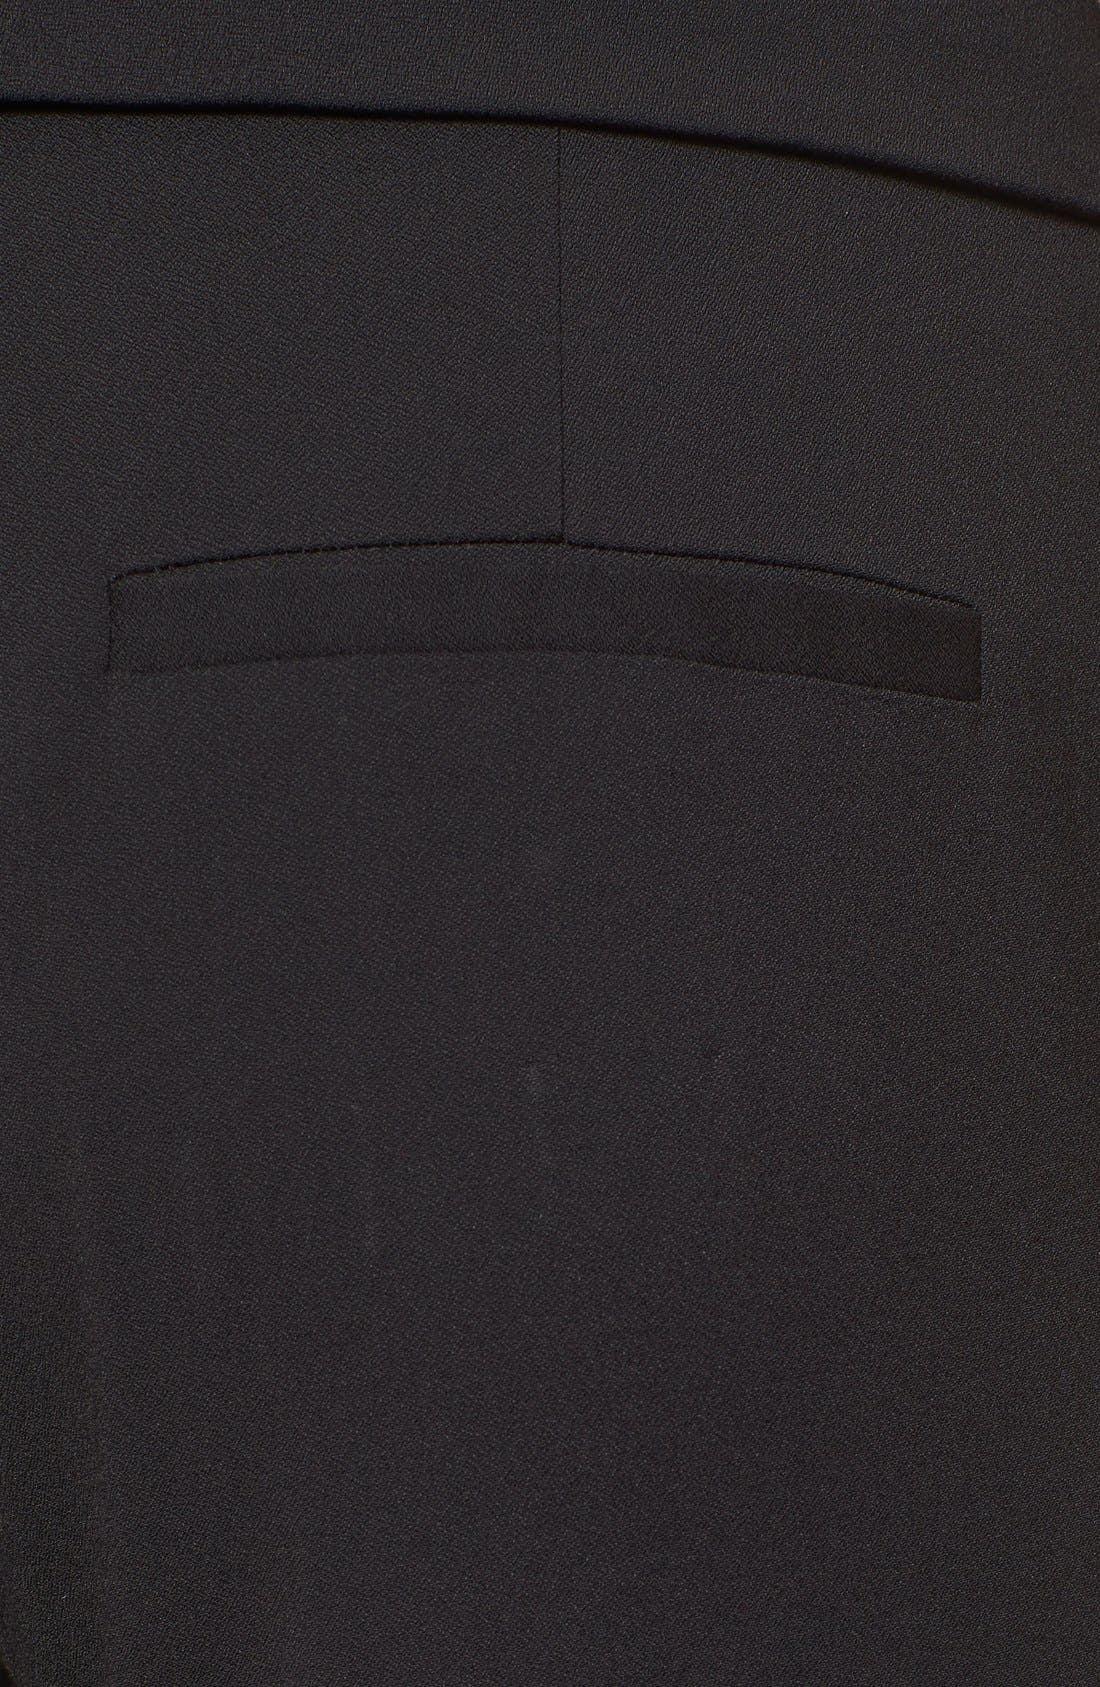 'Delray' Foldover Trousers,                             Alternate thumbnail 4, color,